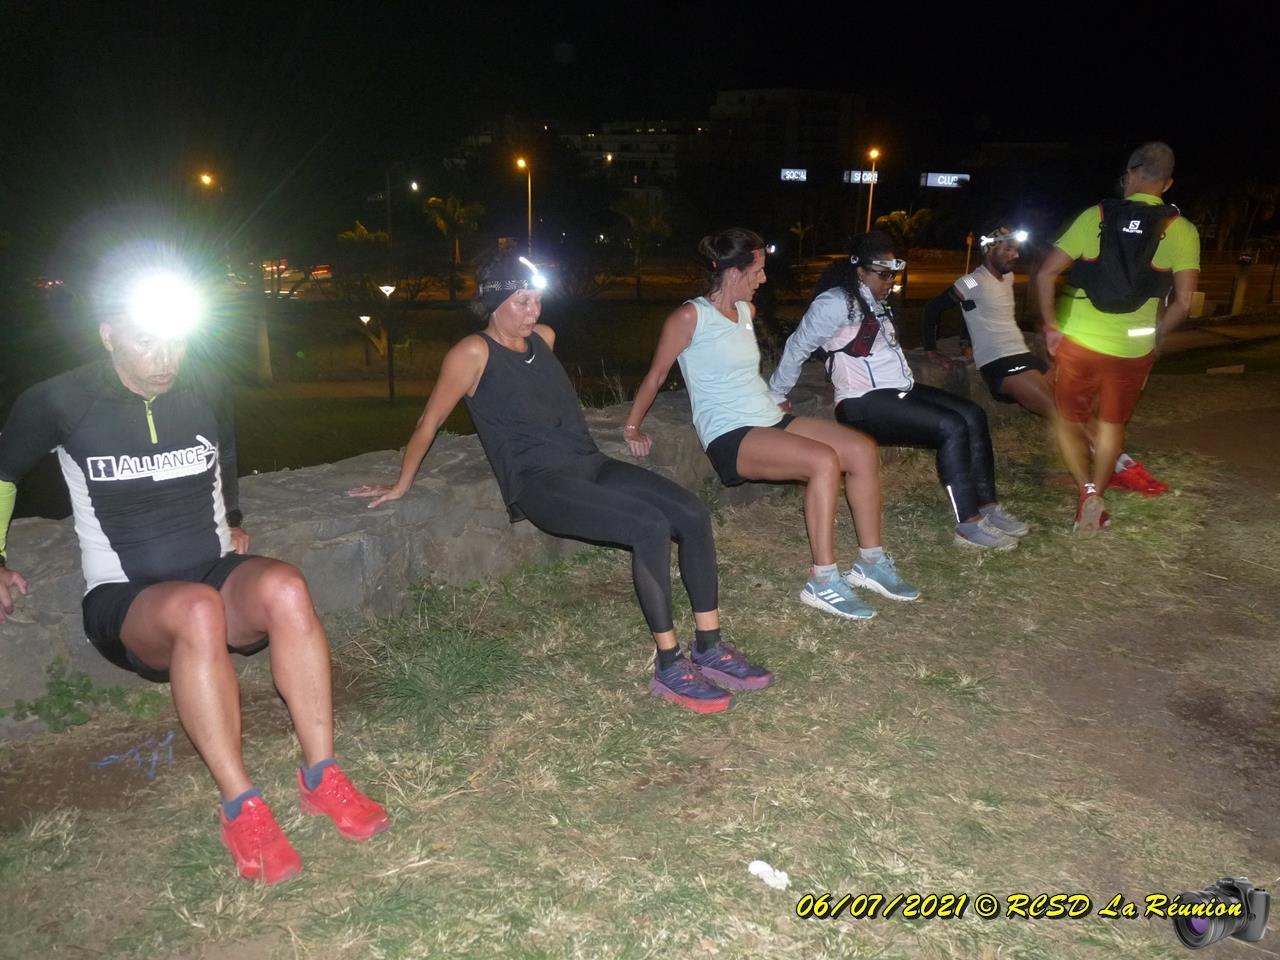 20210706 Entrain Trail Trinité 034